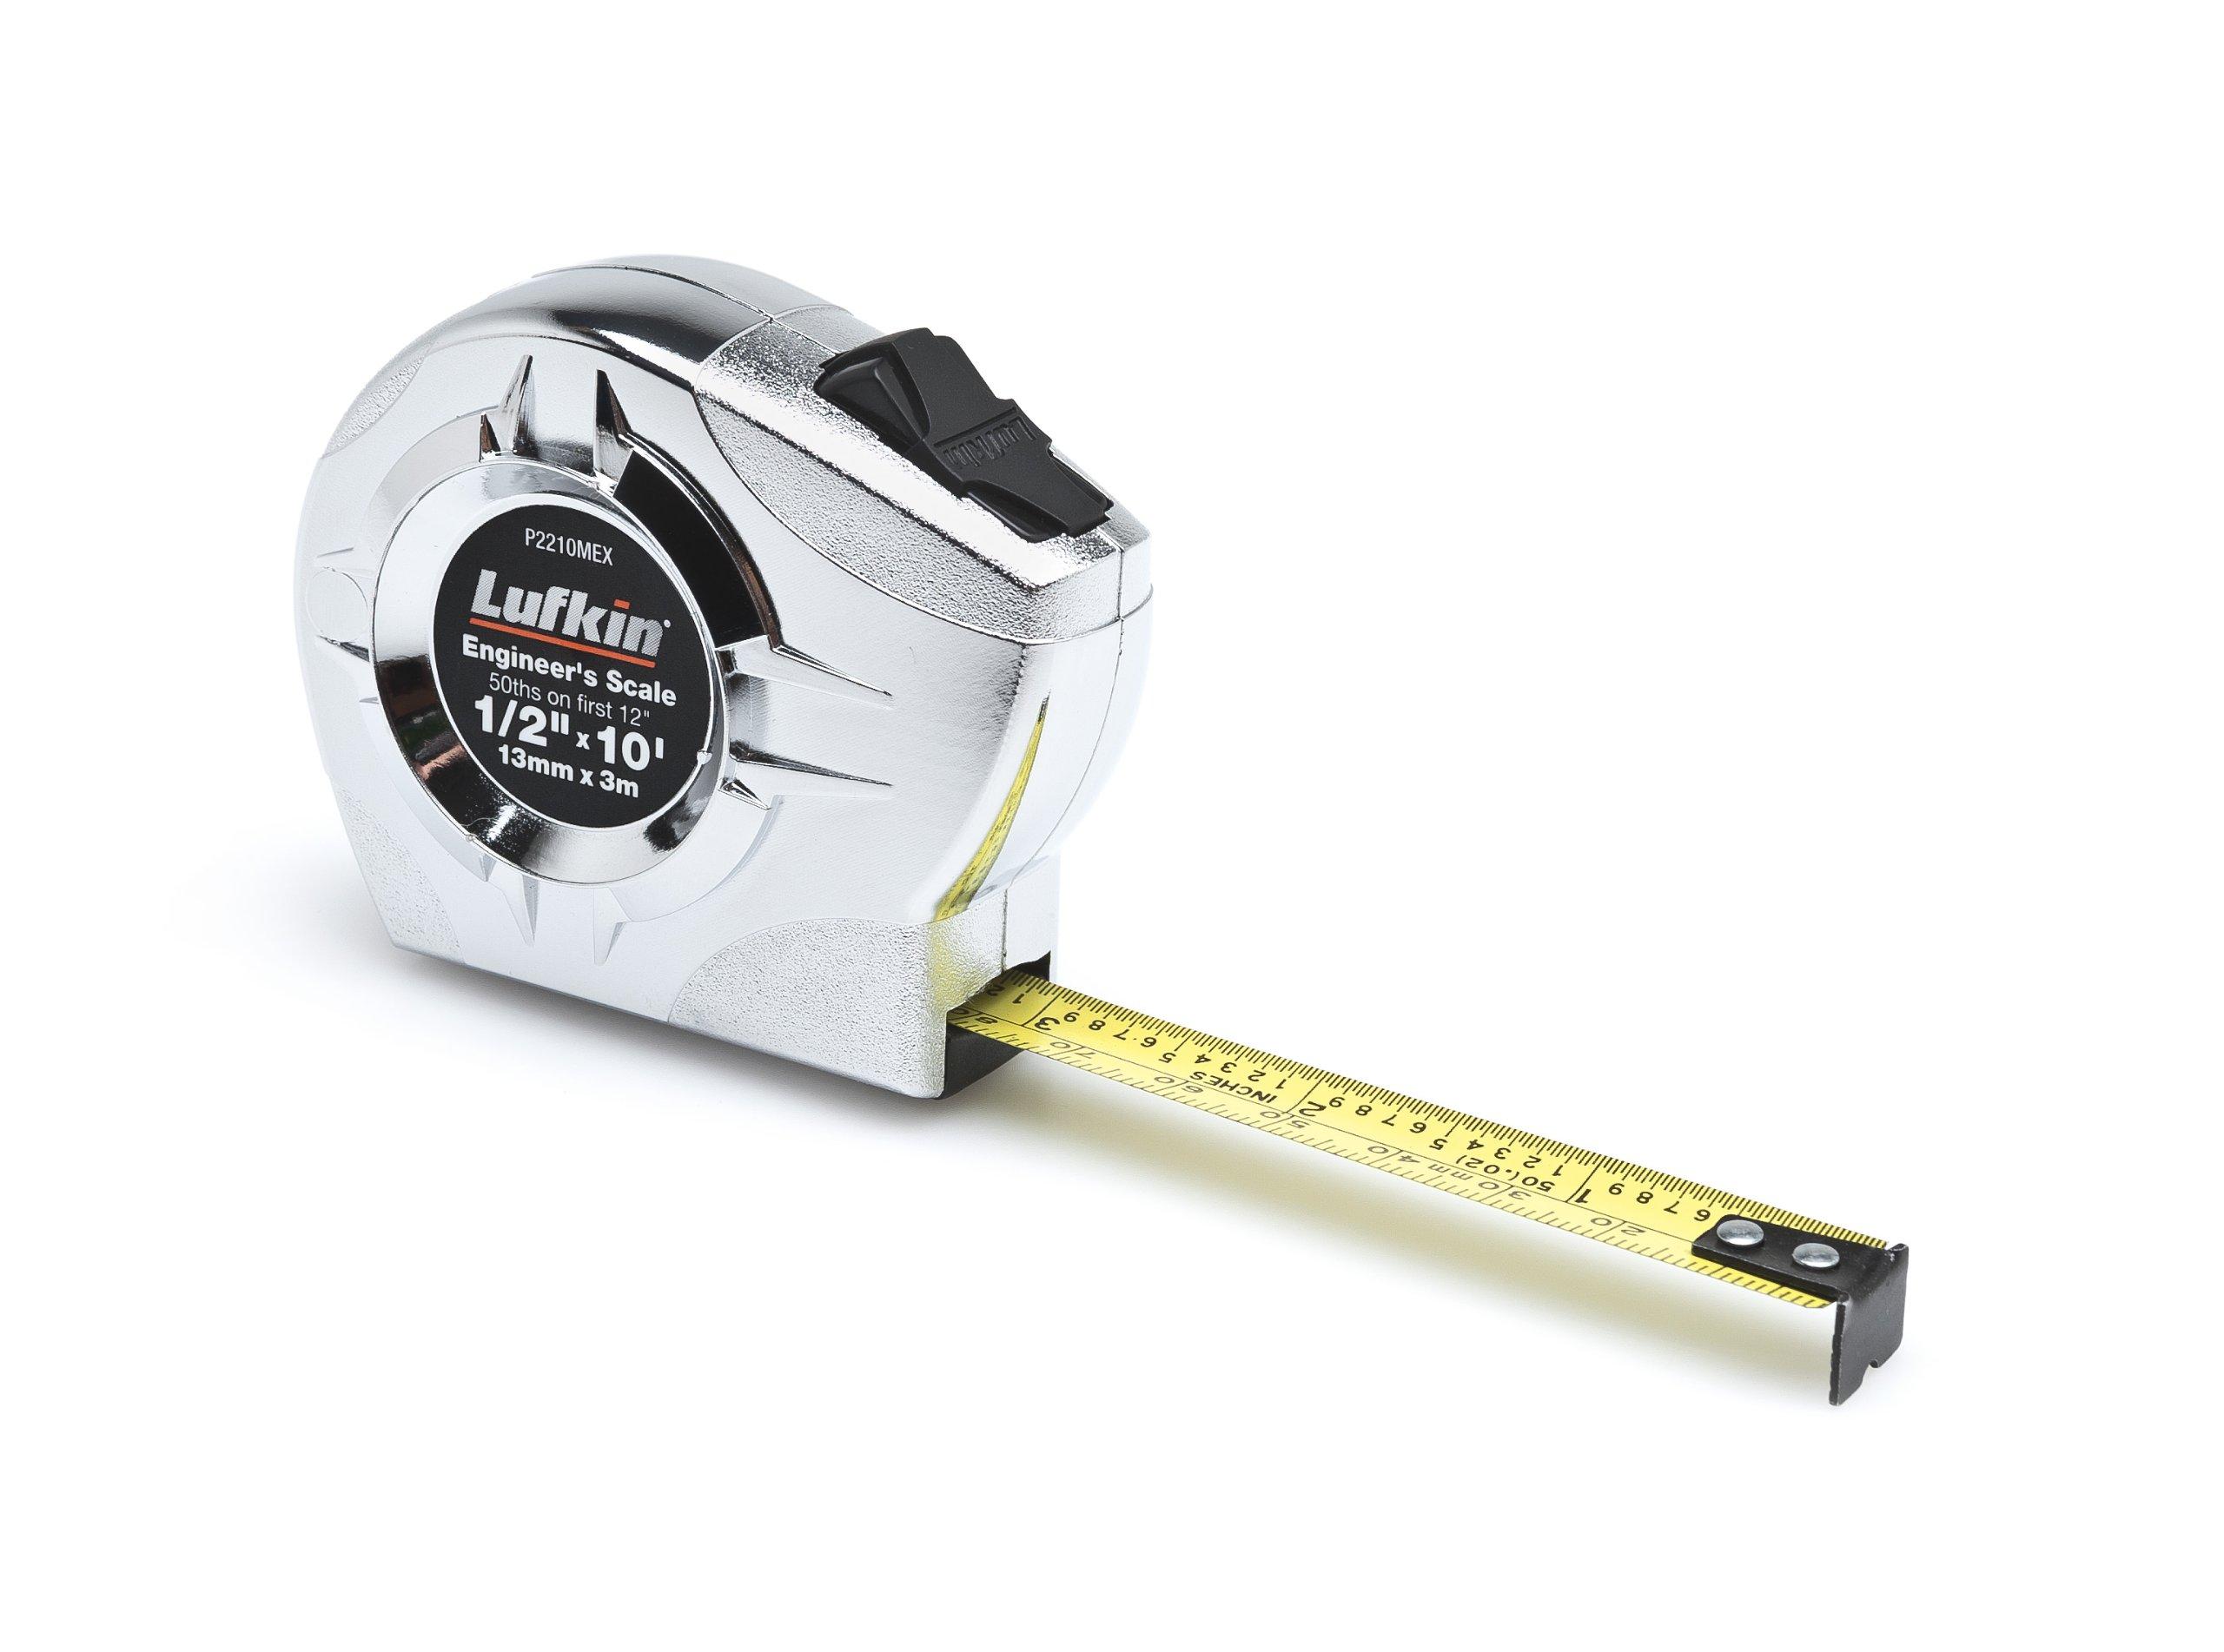 Lufkin P2210MEX 1/2-Inch by 10-Feet P2000 Series Power Return Engineer's Tape Measure, Chrome